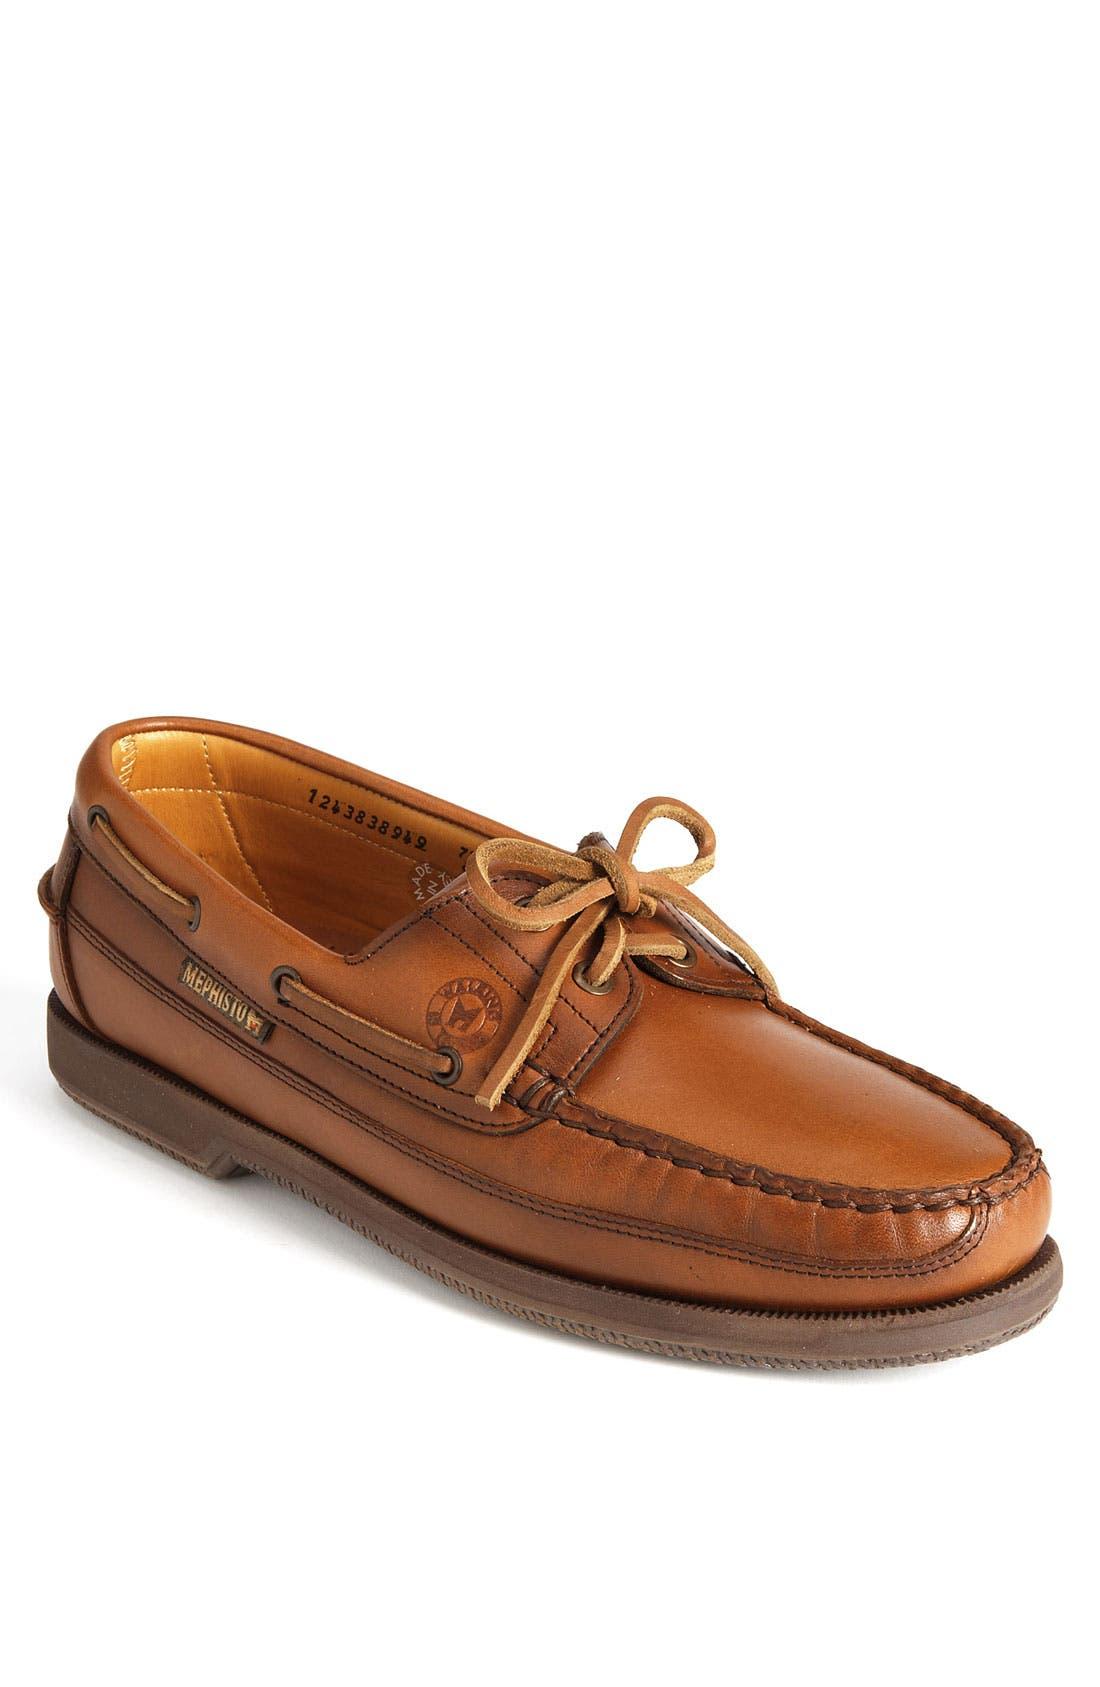 Main Image - Mephisto 'Hurrikan' Boat Shoe